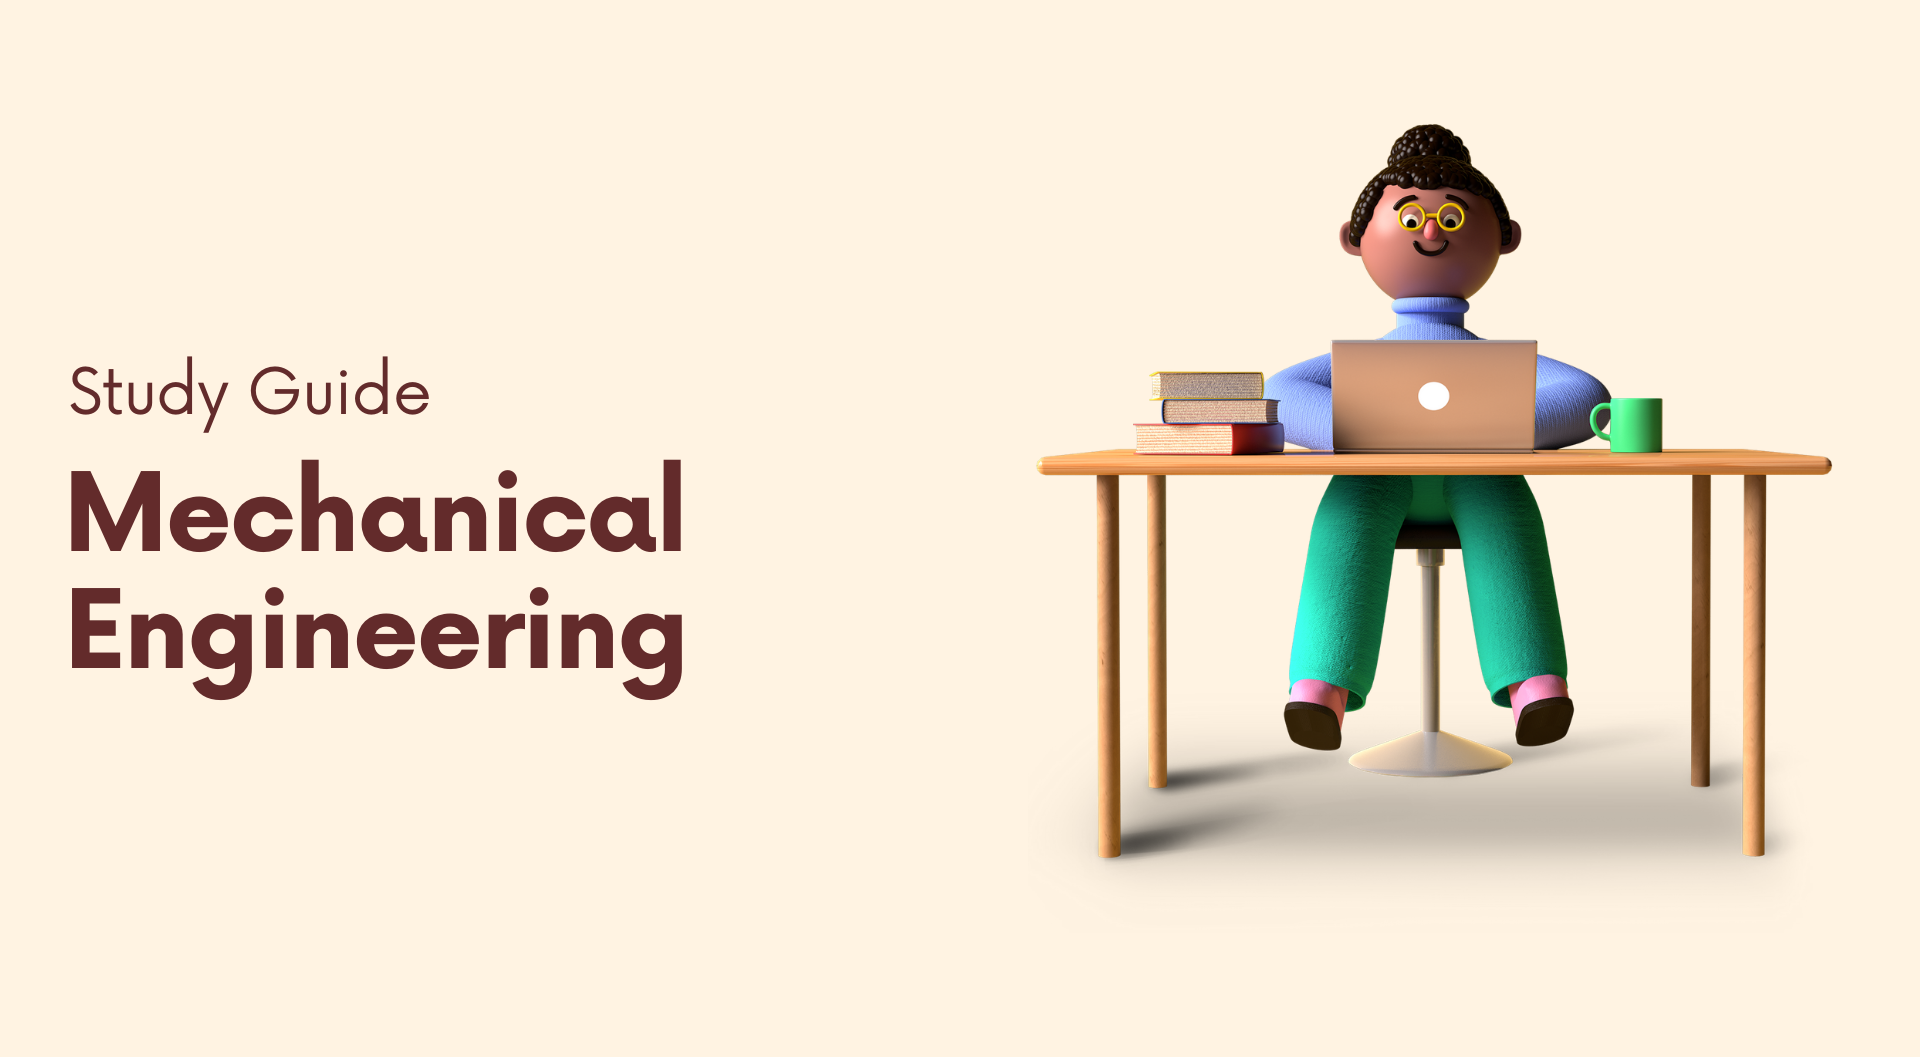 Study Guide: Mechanical Engineering